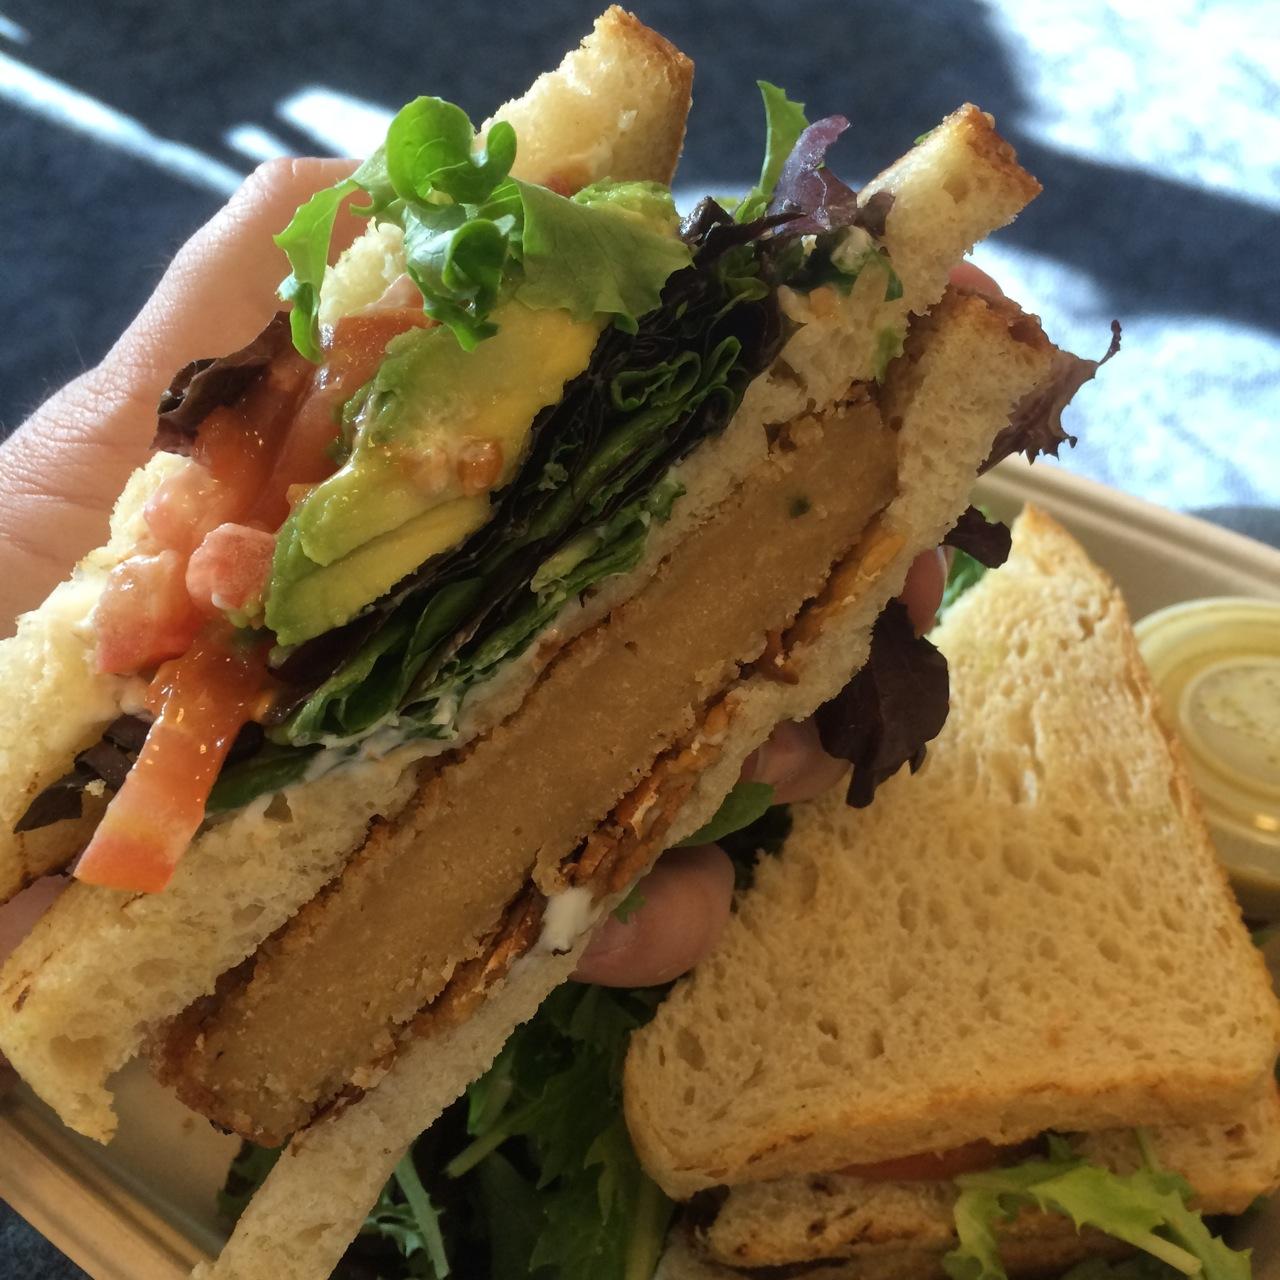 http://i2.wp.com/fatgayvegan.com/wp-content/uploads/2015/06/side-view-vegan-club-real-food-daily.jpg?fit=1280%2C1280